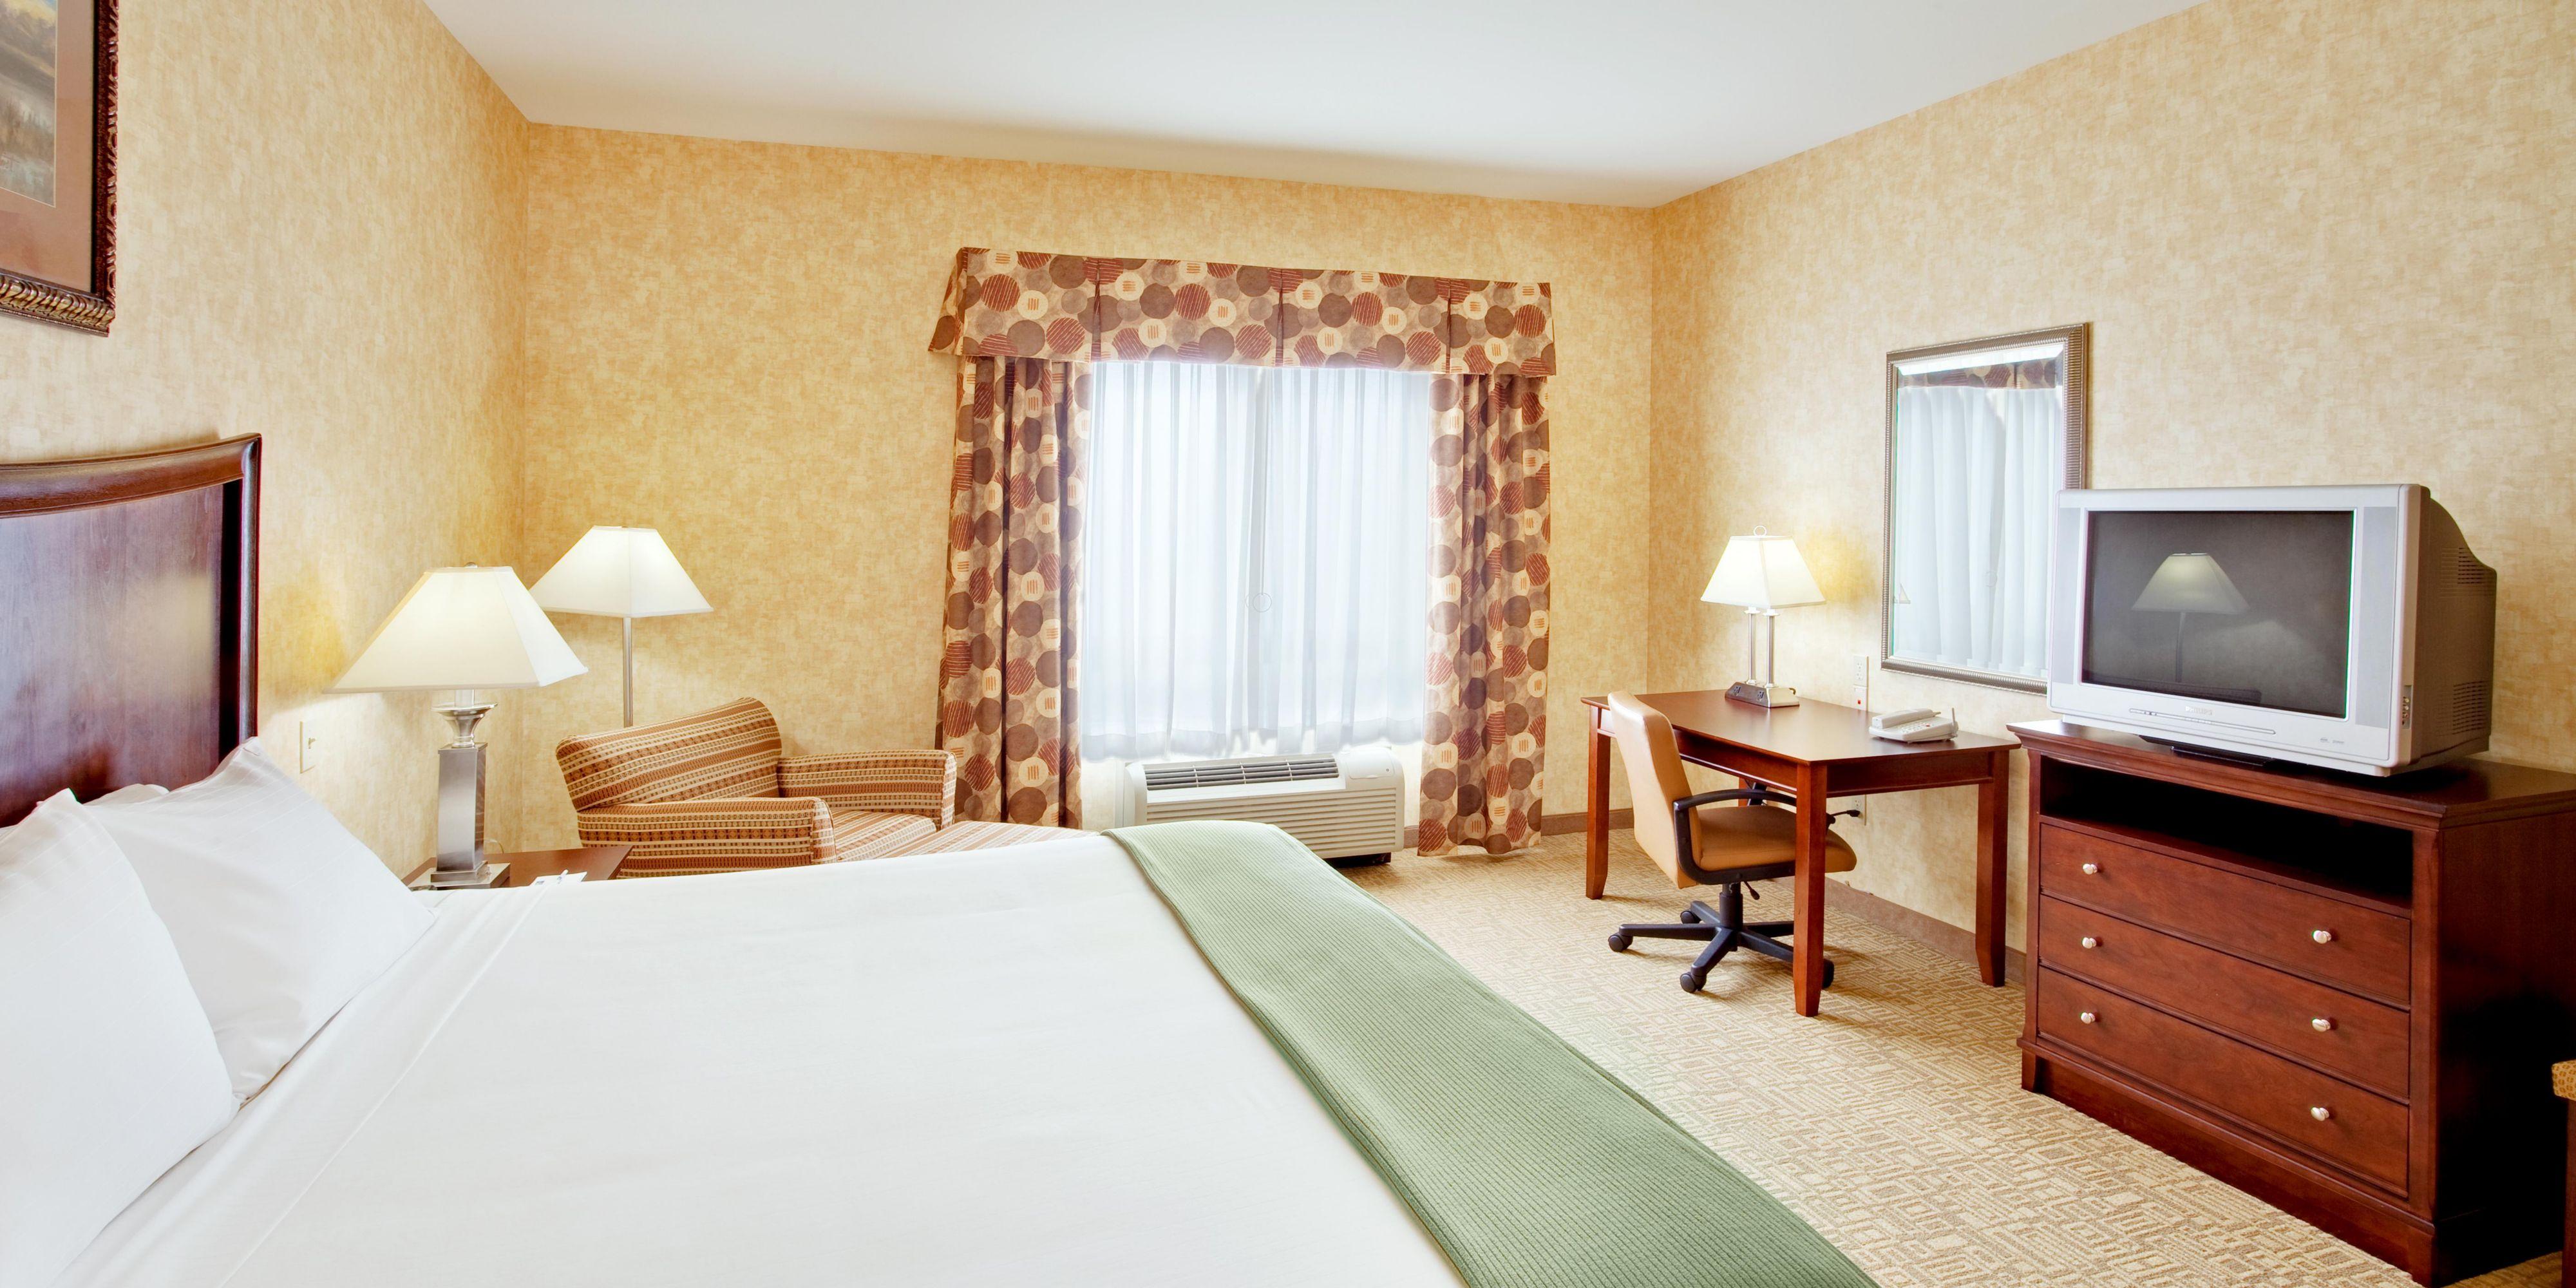 Holiday Inn Express Suites Bethlehem ArptAllentown Area Hotel - Google maps satellite bethlehem us hotel